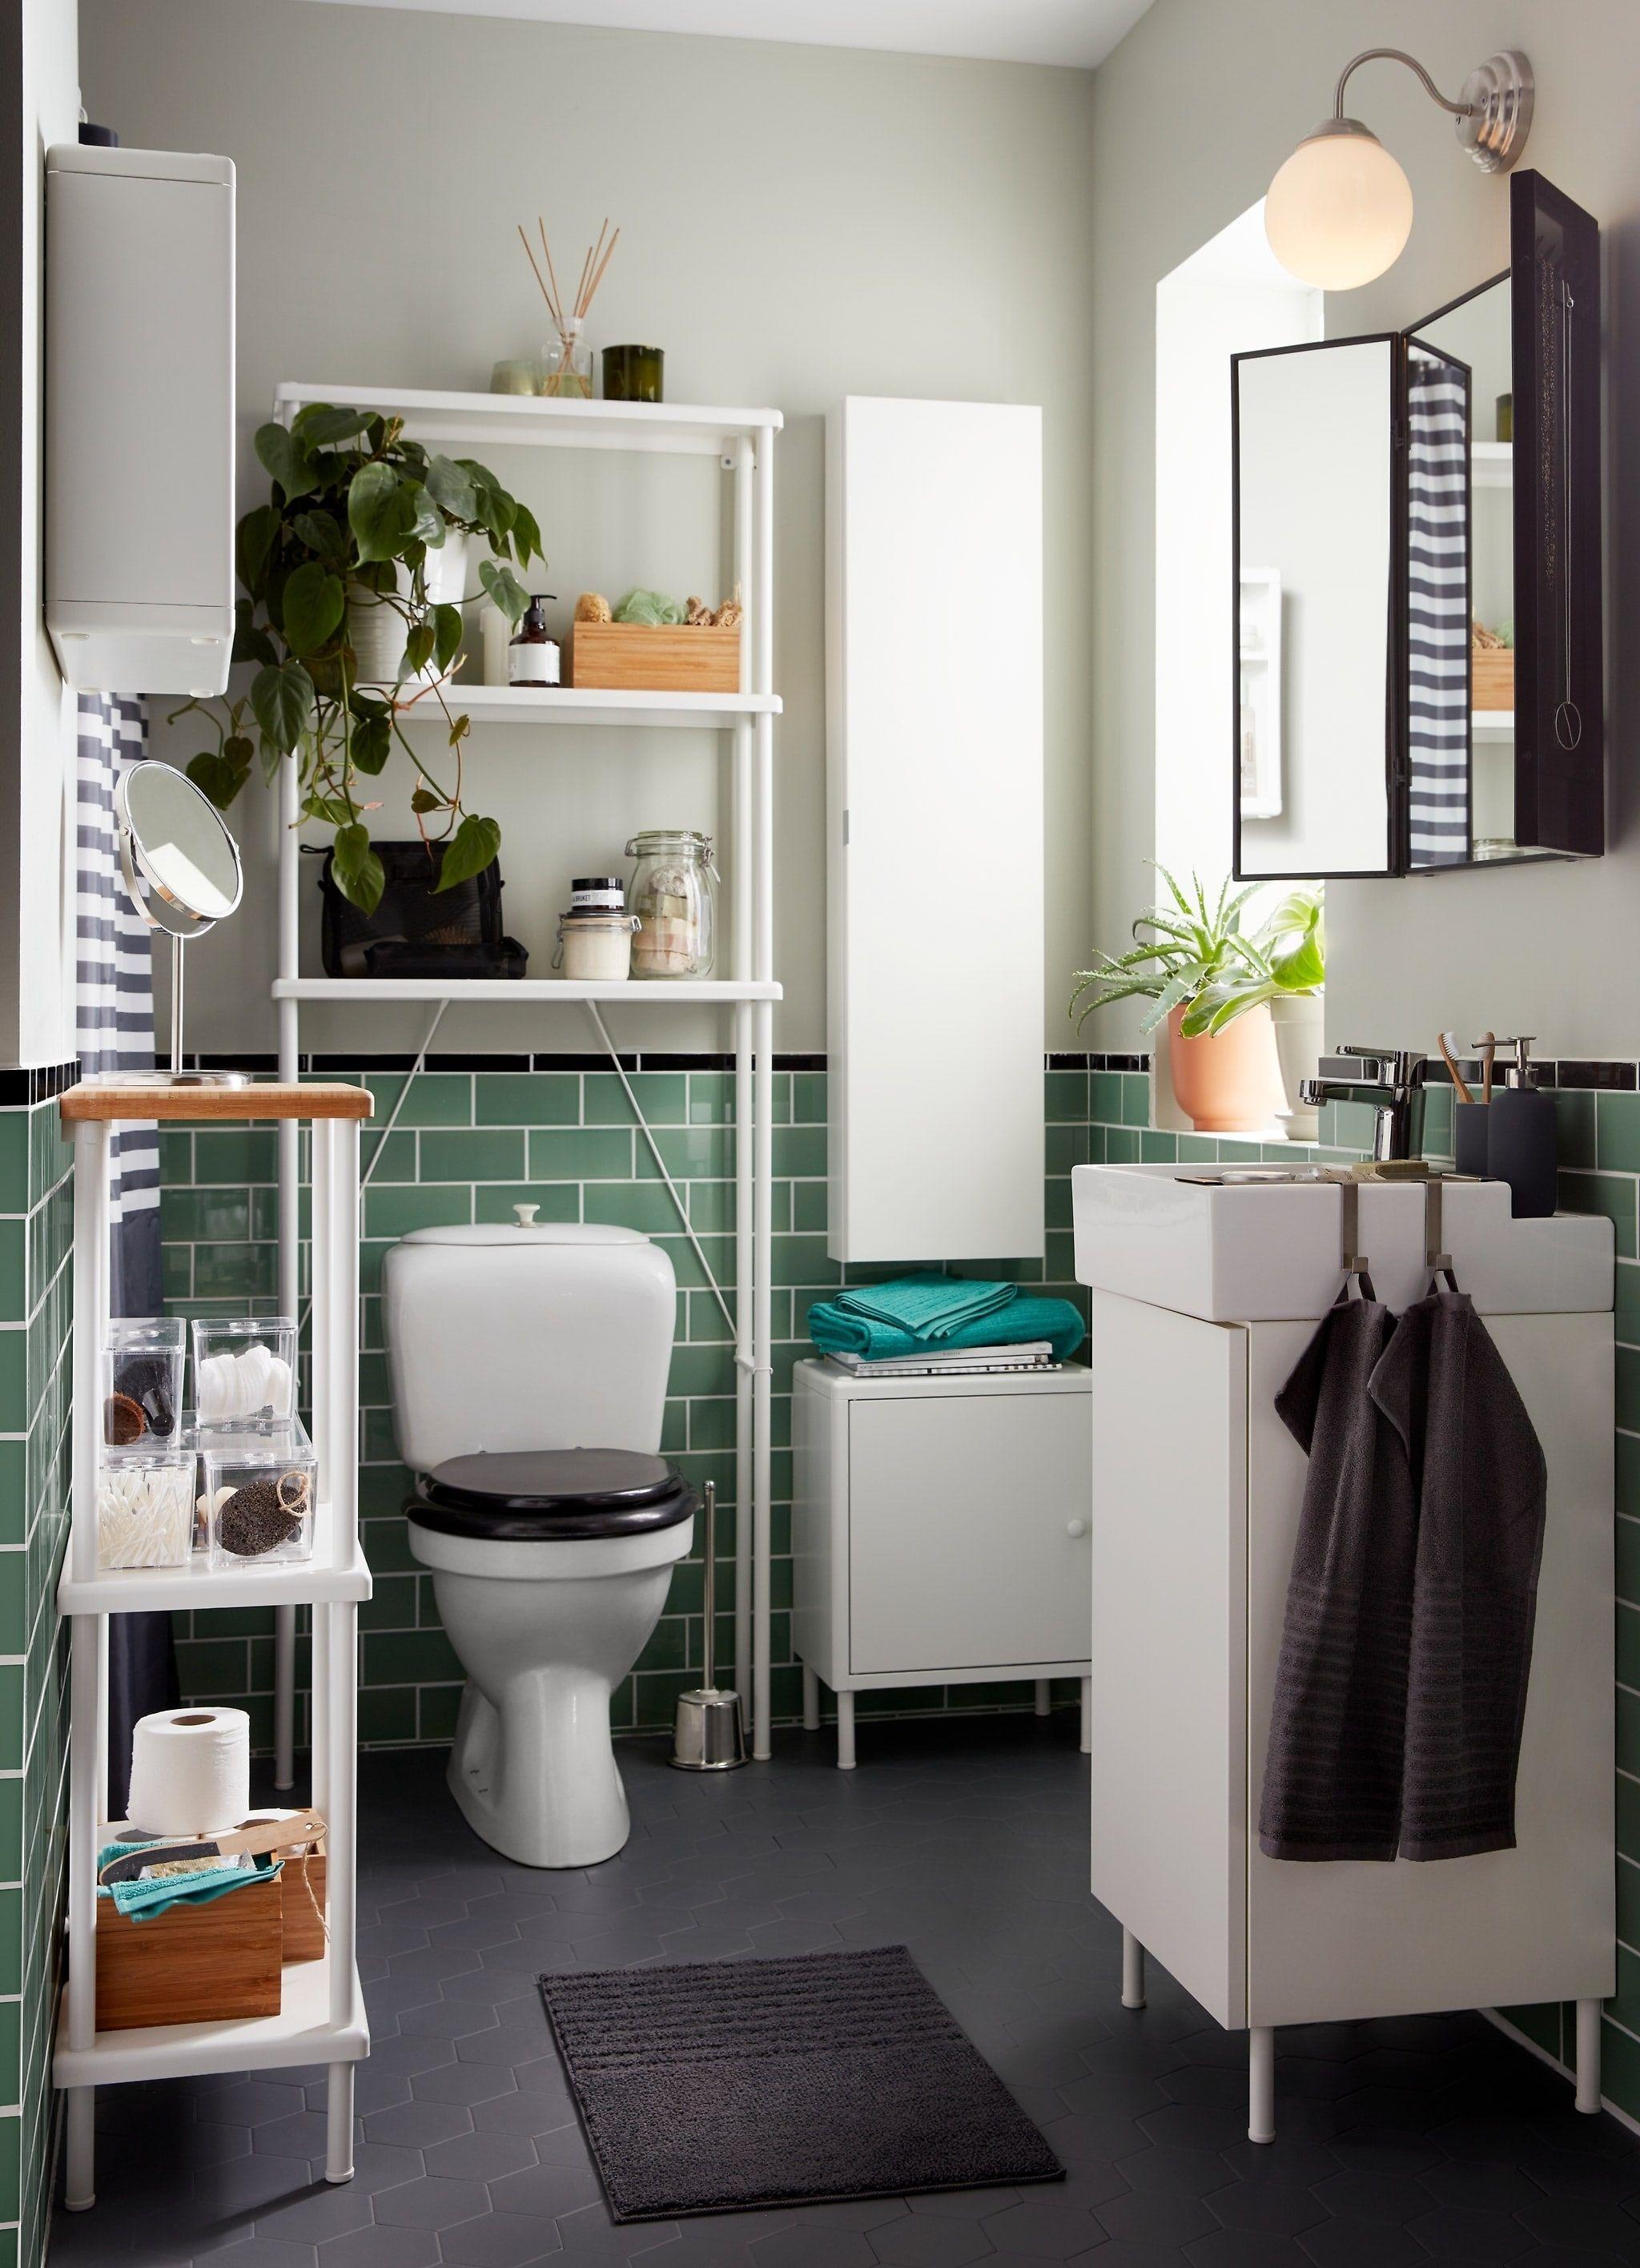 Luxury Inspirational Ikea Small Bathroom Ideas IJ100k10 https